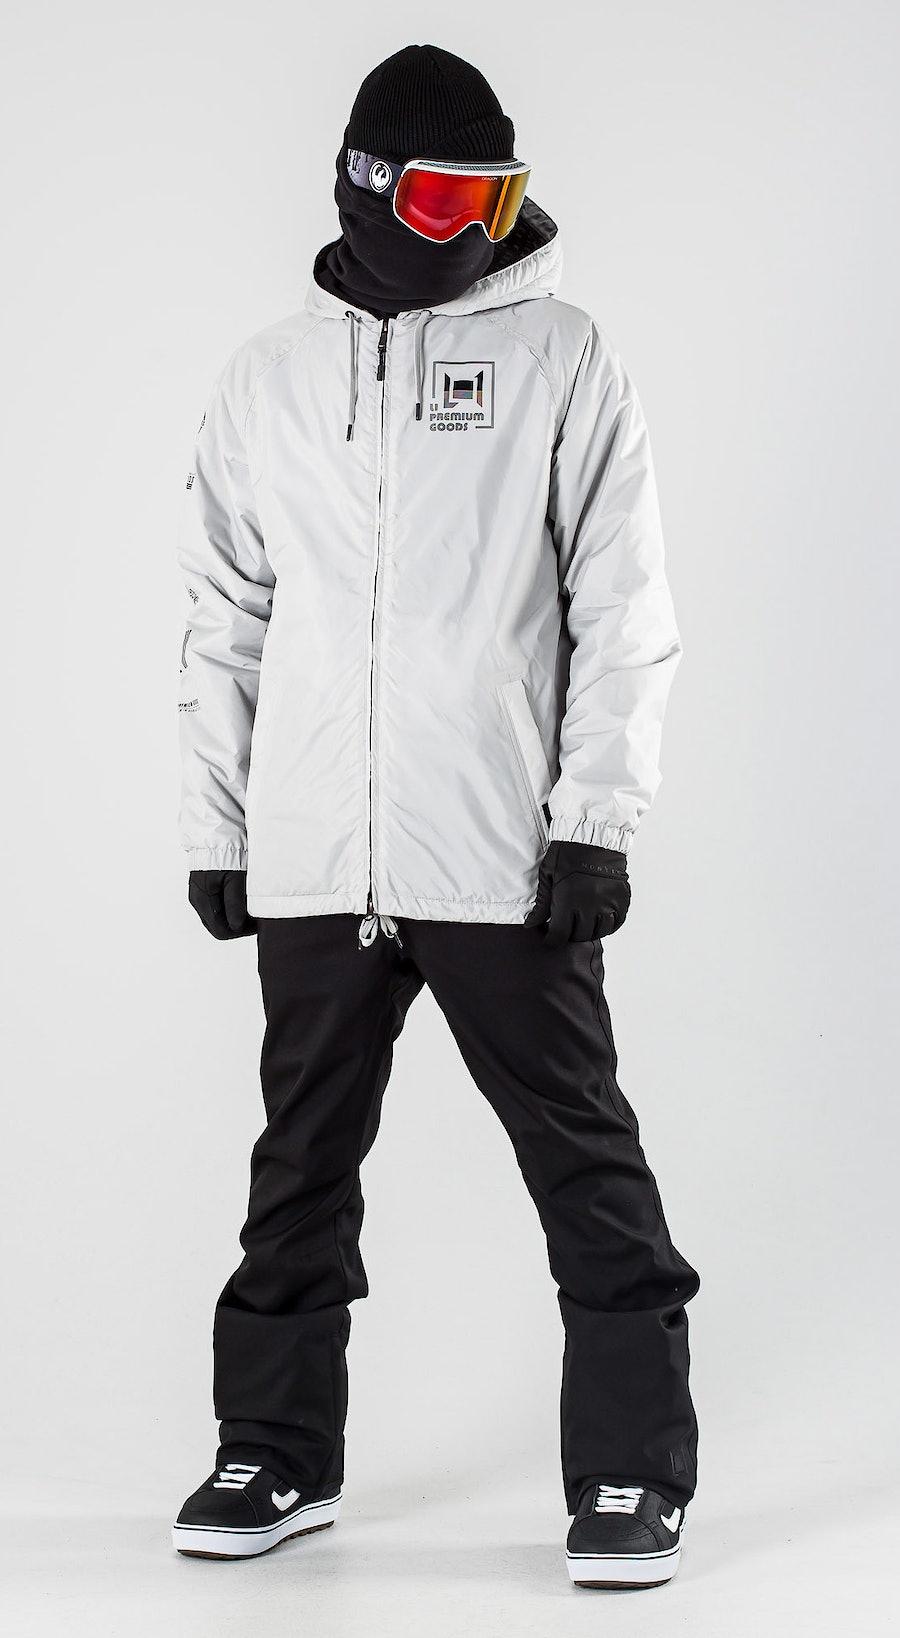 L1 Stooge Ghost Vêtements de Snowboard  Multi